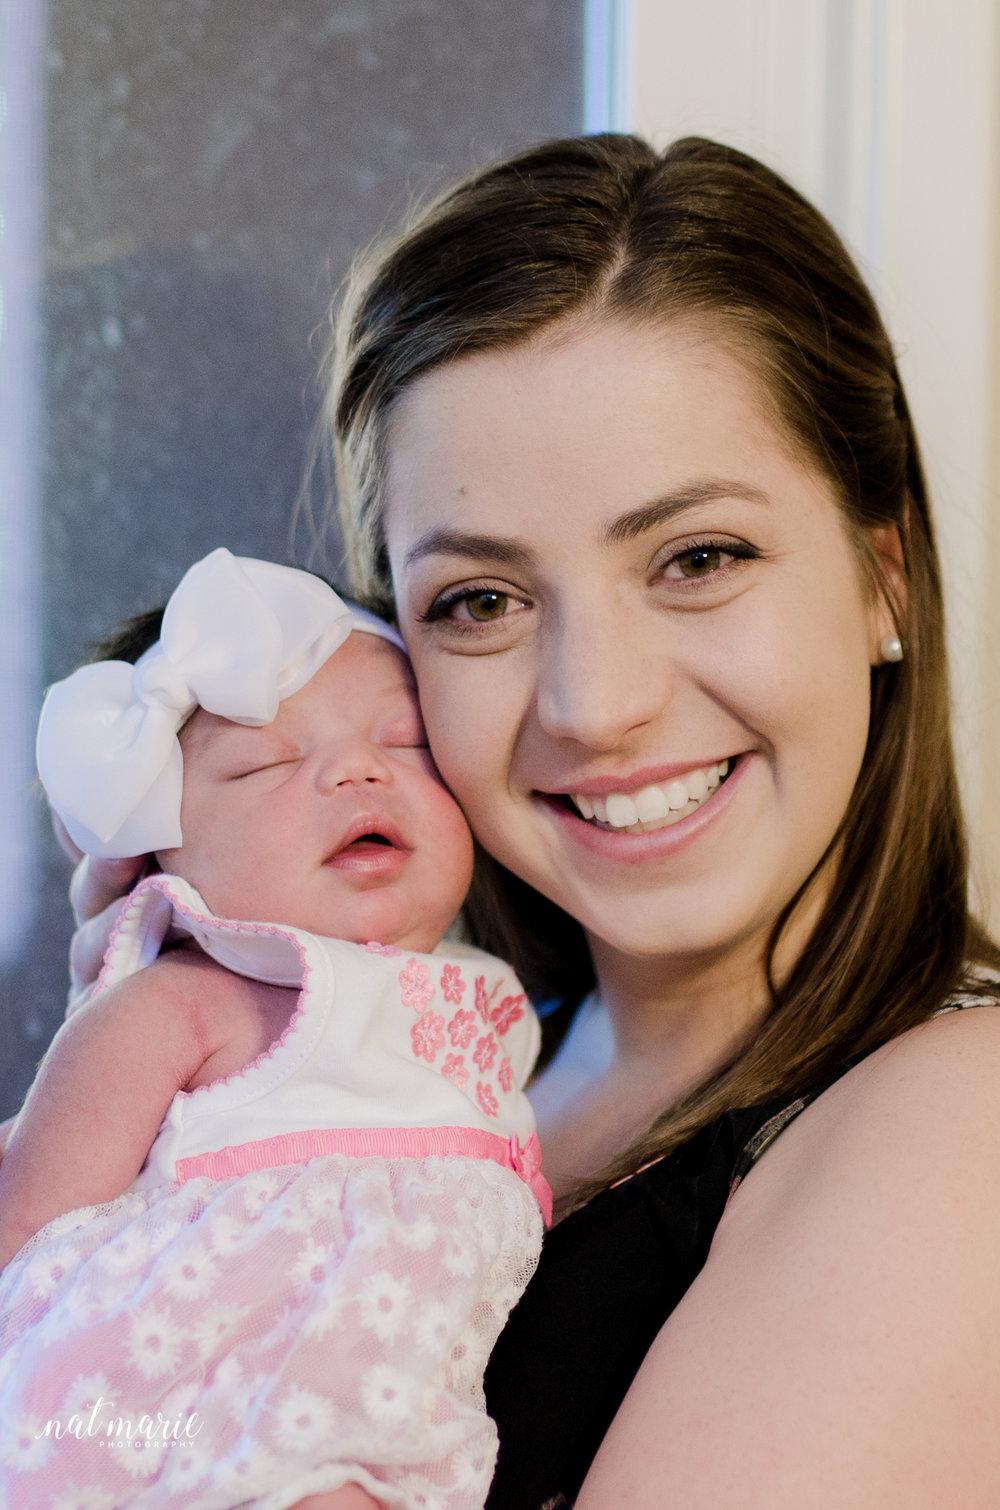 Scottsdale, AZ In-home Lifestyle Newborn Session - Beautiful Photography